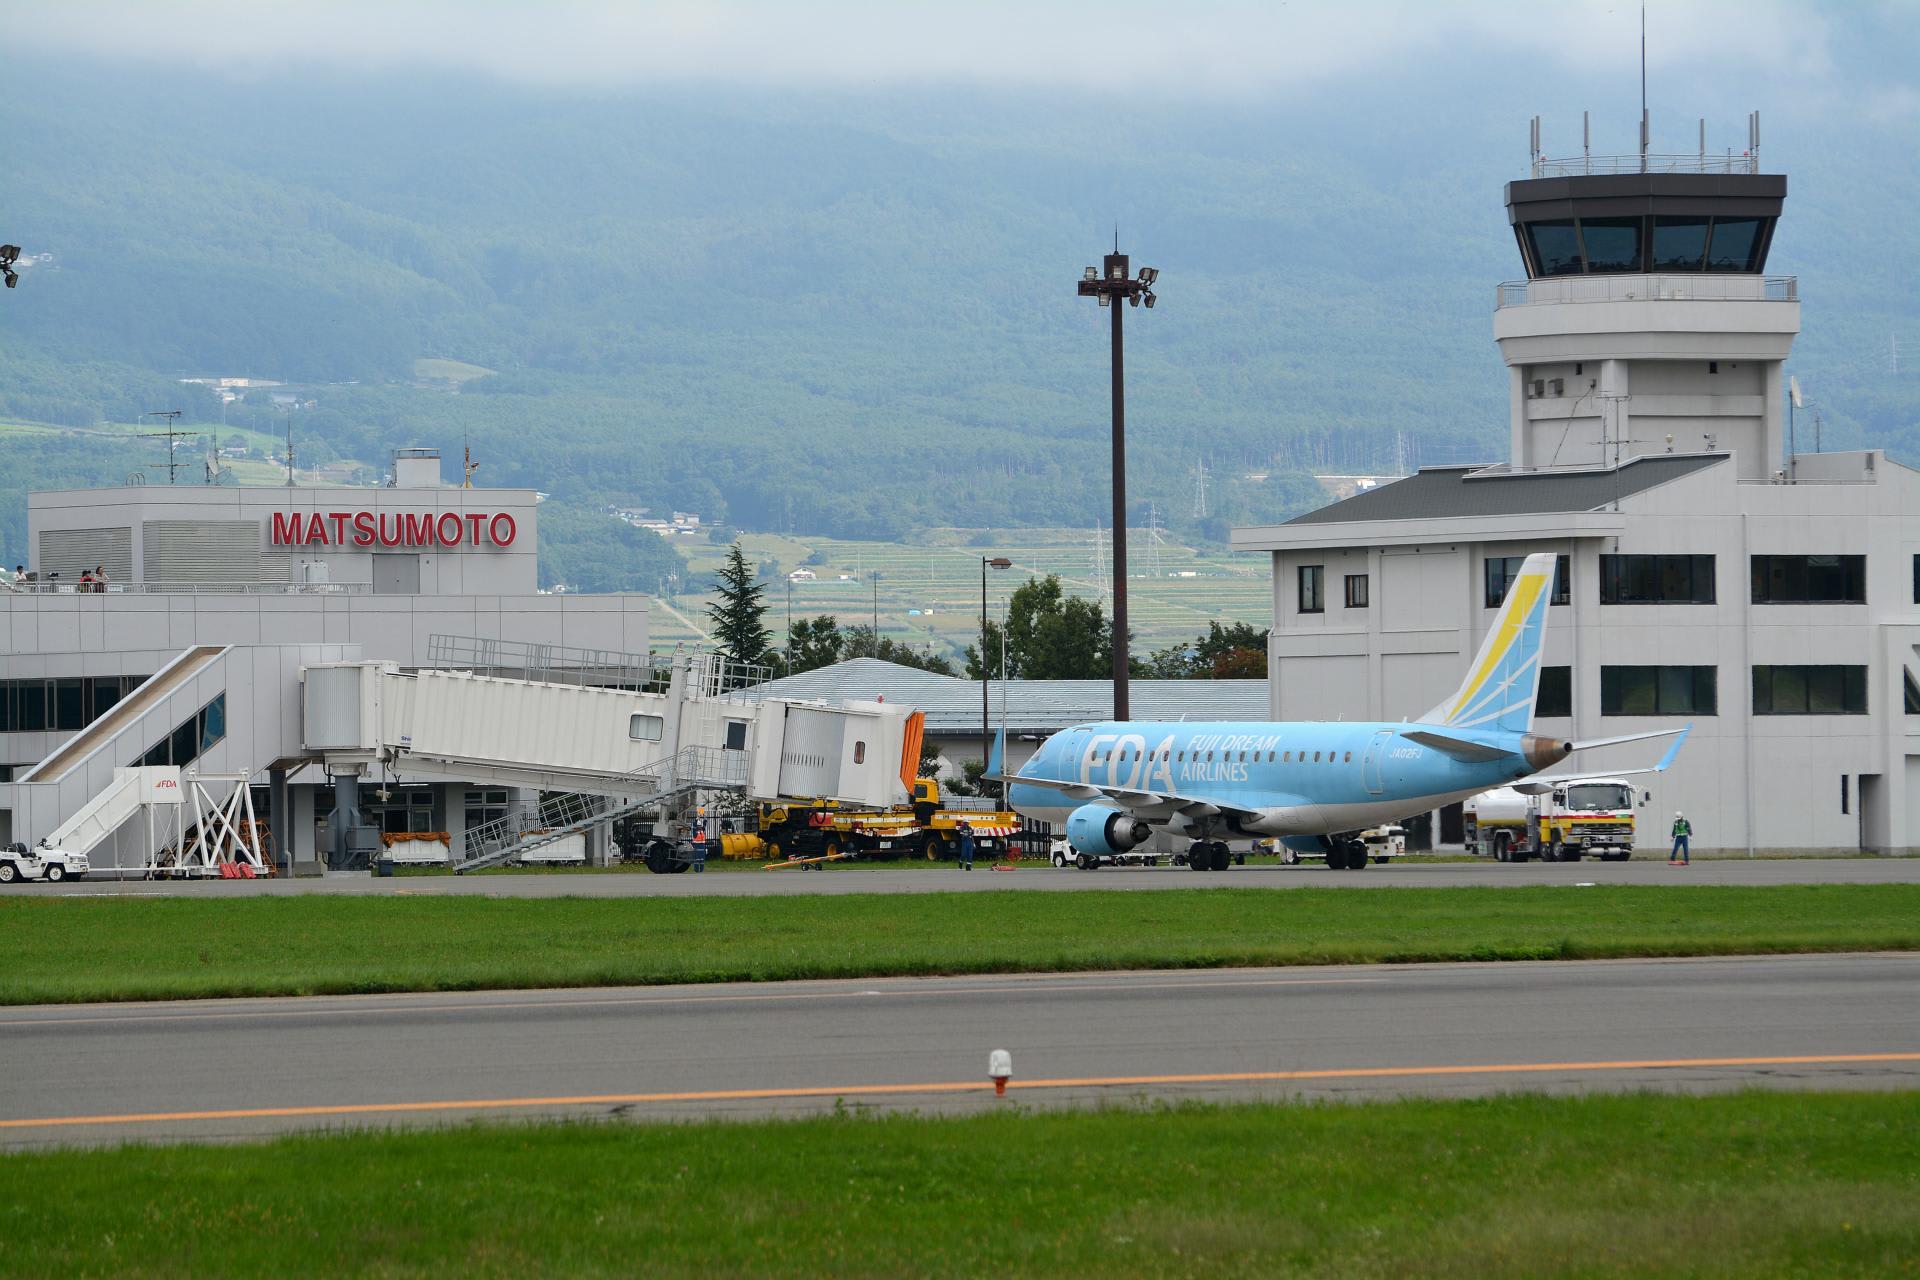 旅客機撮影@関西  Airline photos @ Kansai Japan